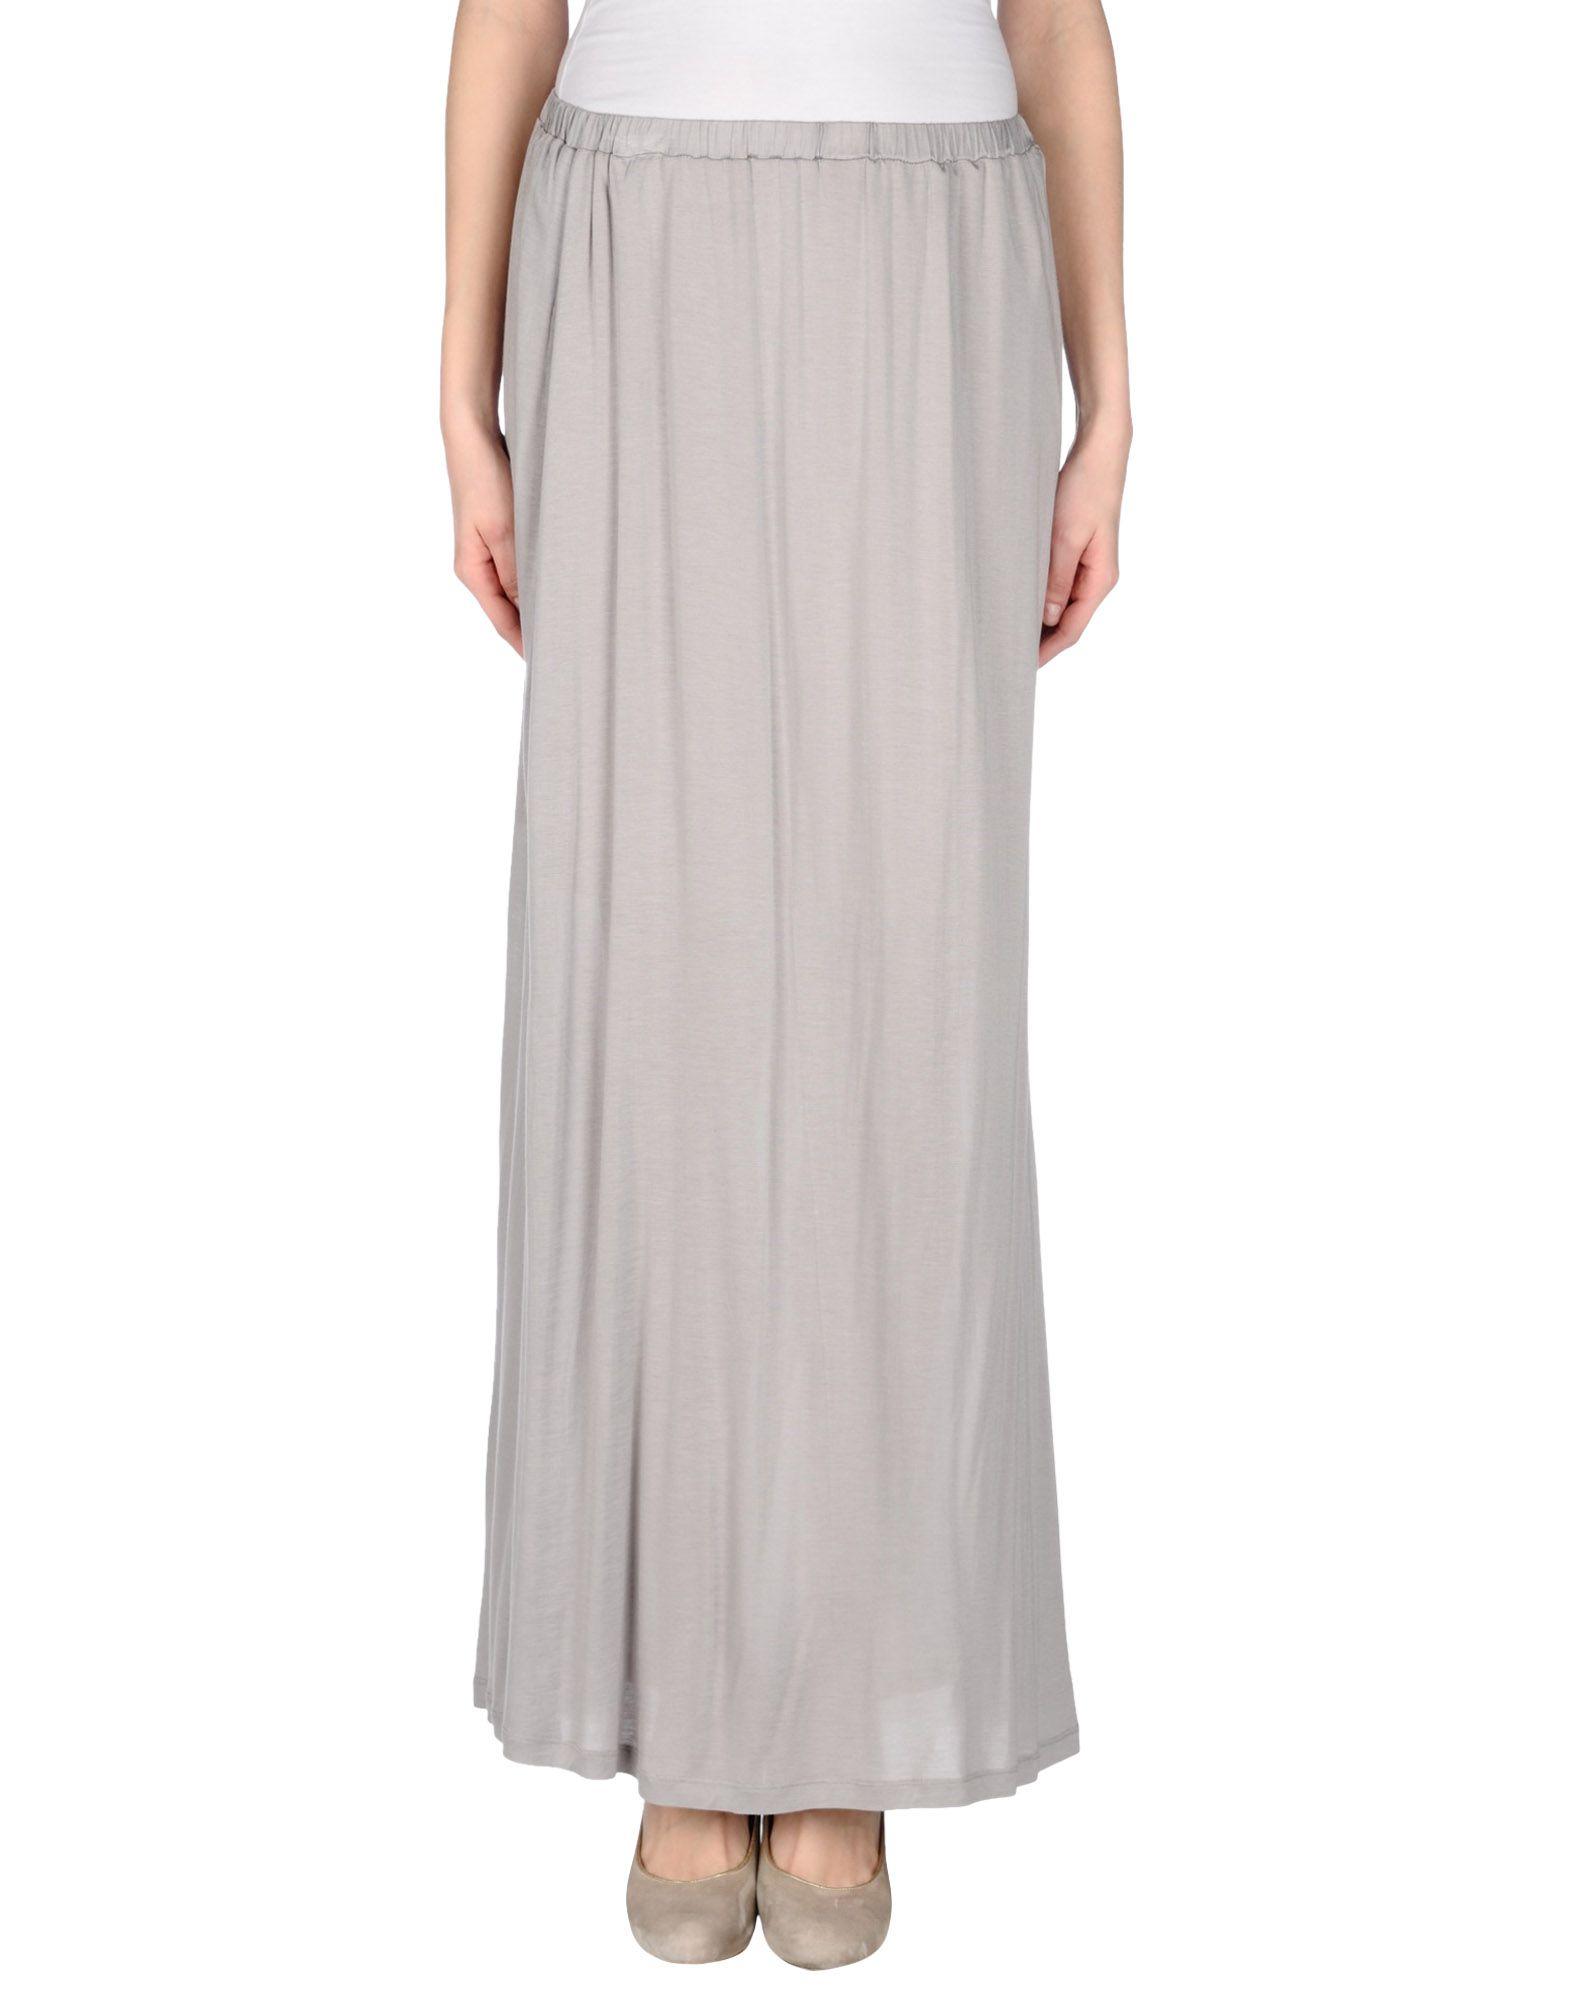 Long Grey Skirt 32